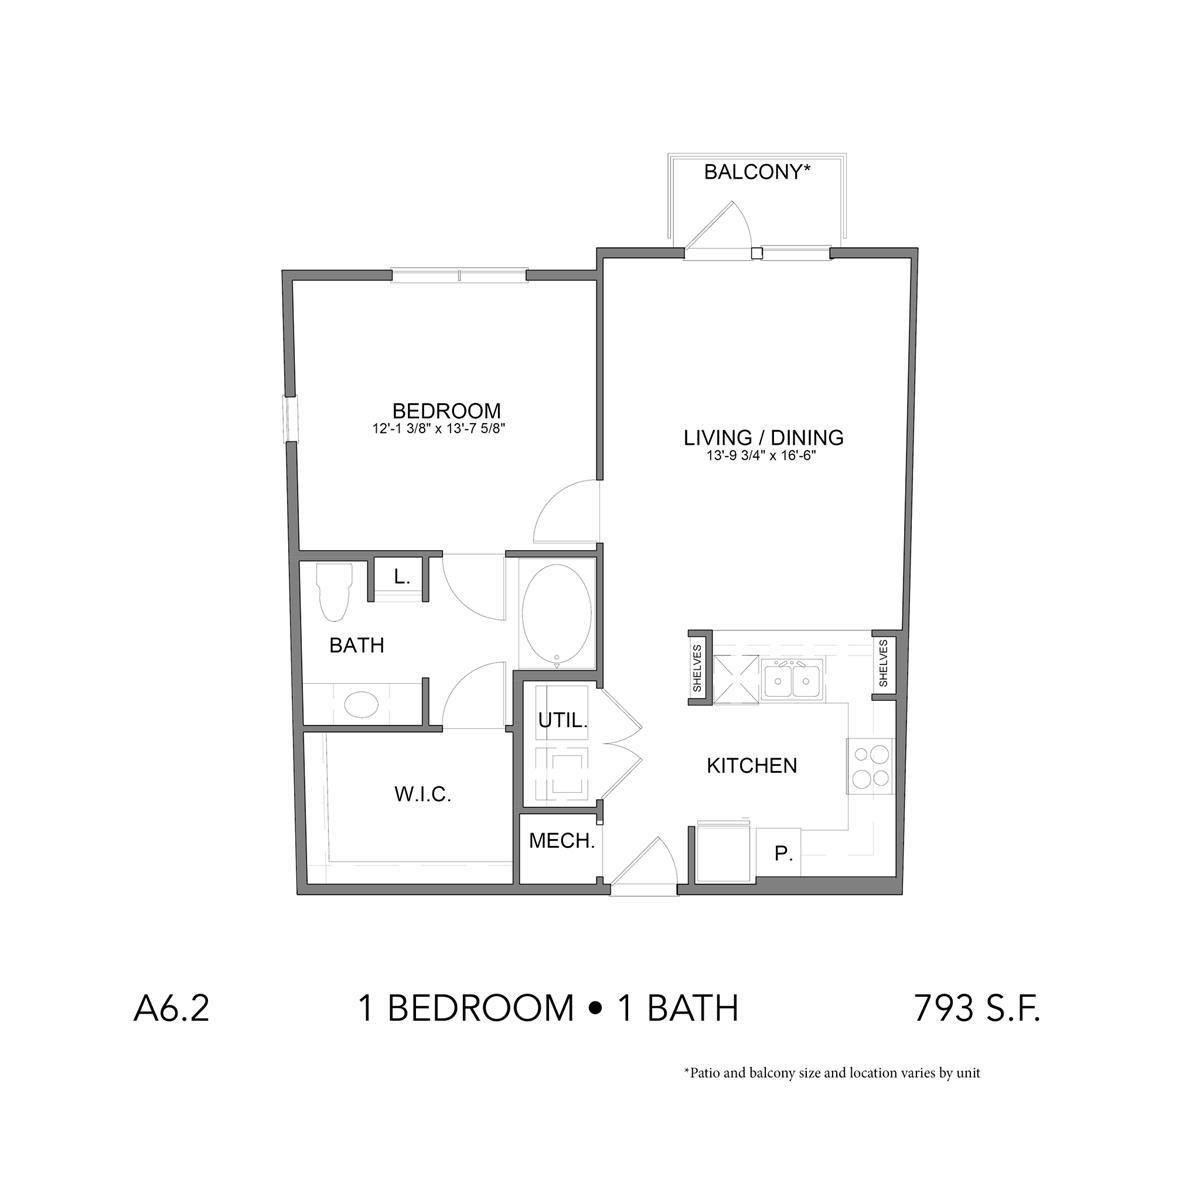 793 sq. ft. A6.2 floor plan